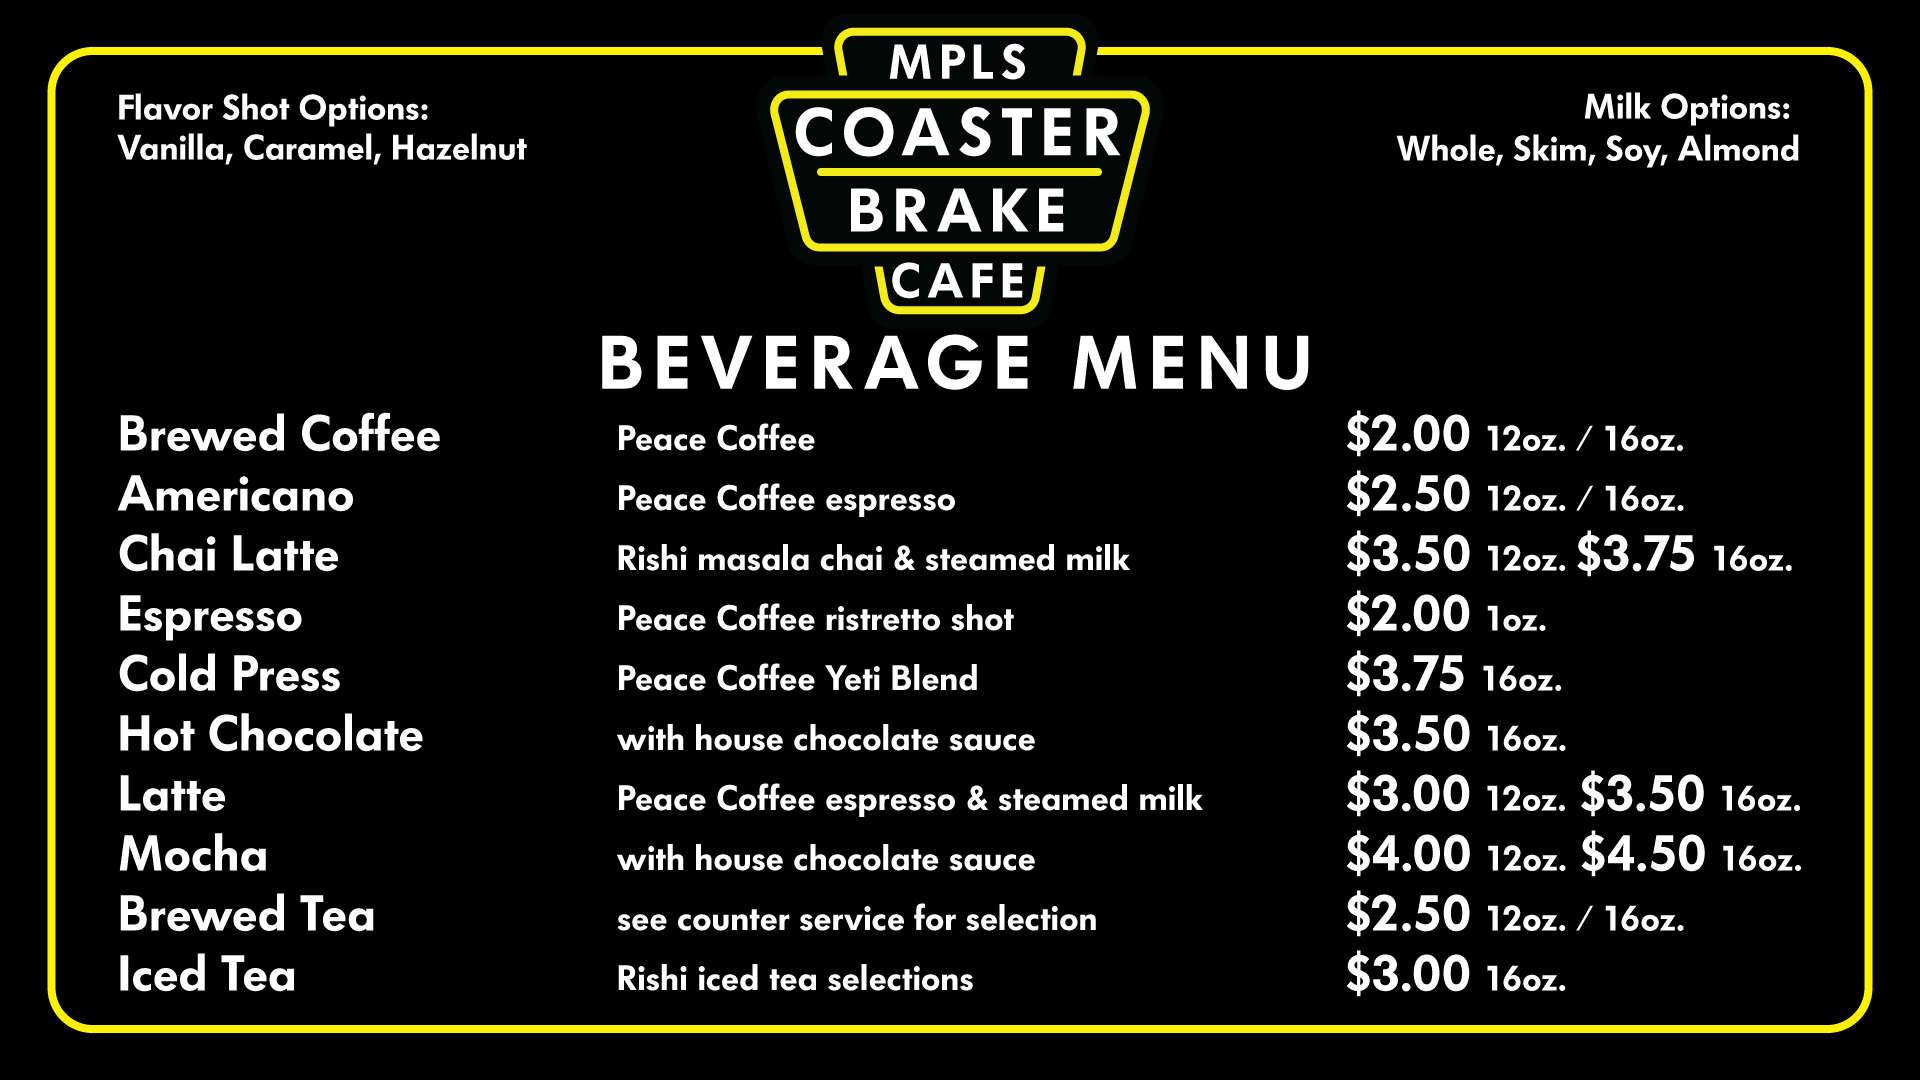 Coaster Brake Cafe - Freewheel Bike Shop - Minneapolis - Twin Cities